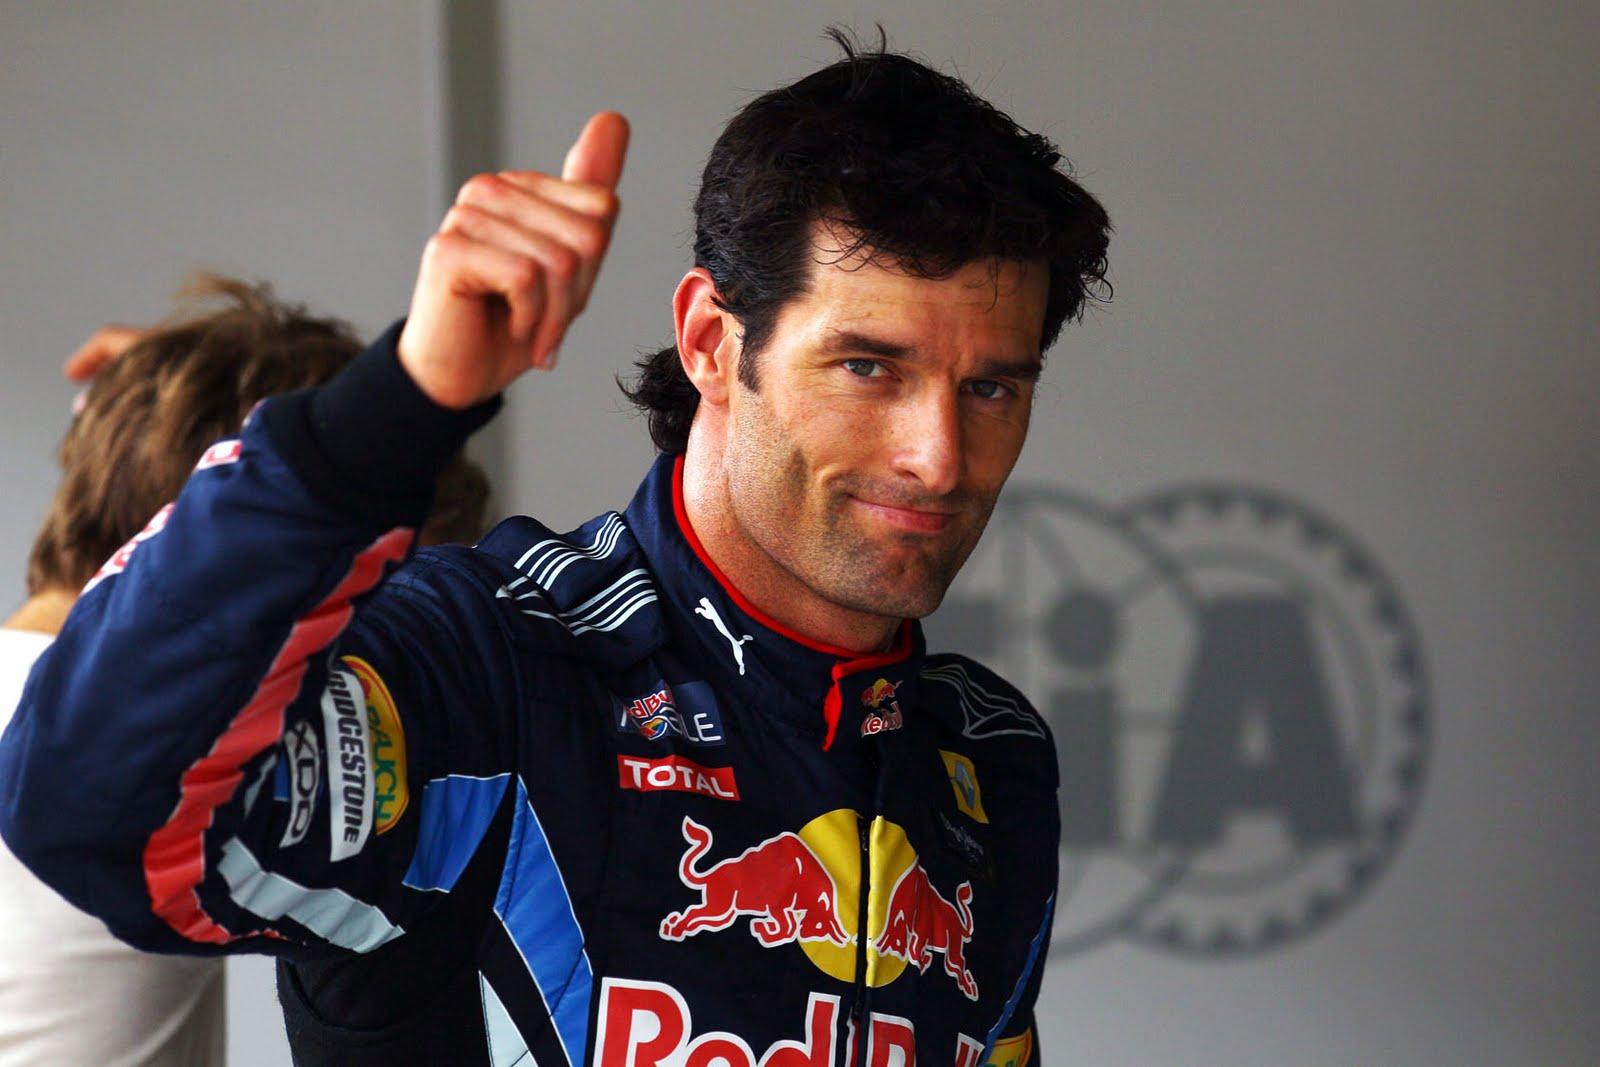 Mark Webber, pilota 2013 della Red Bull